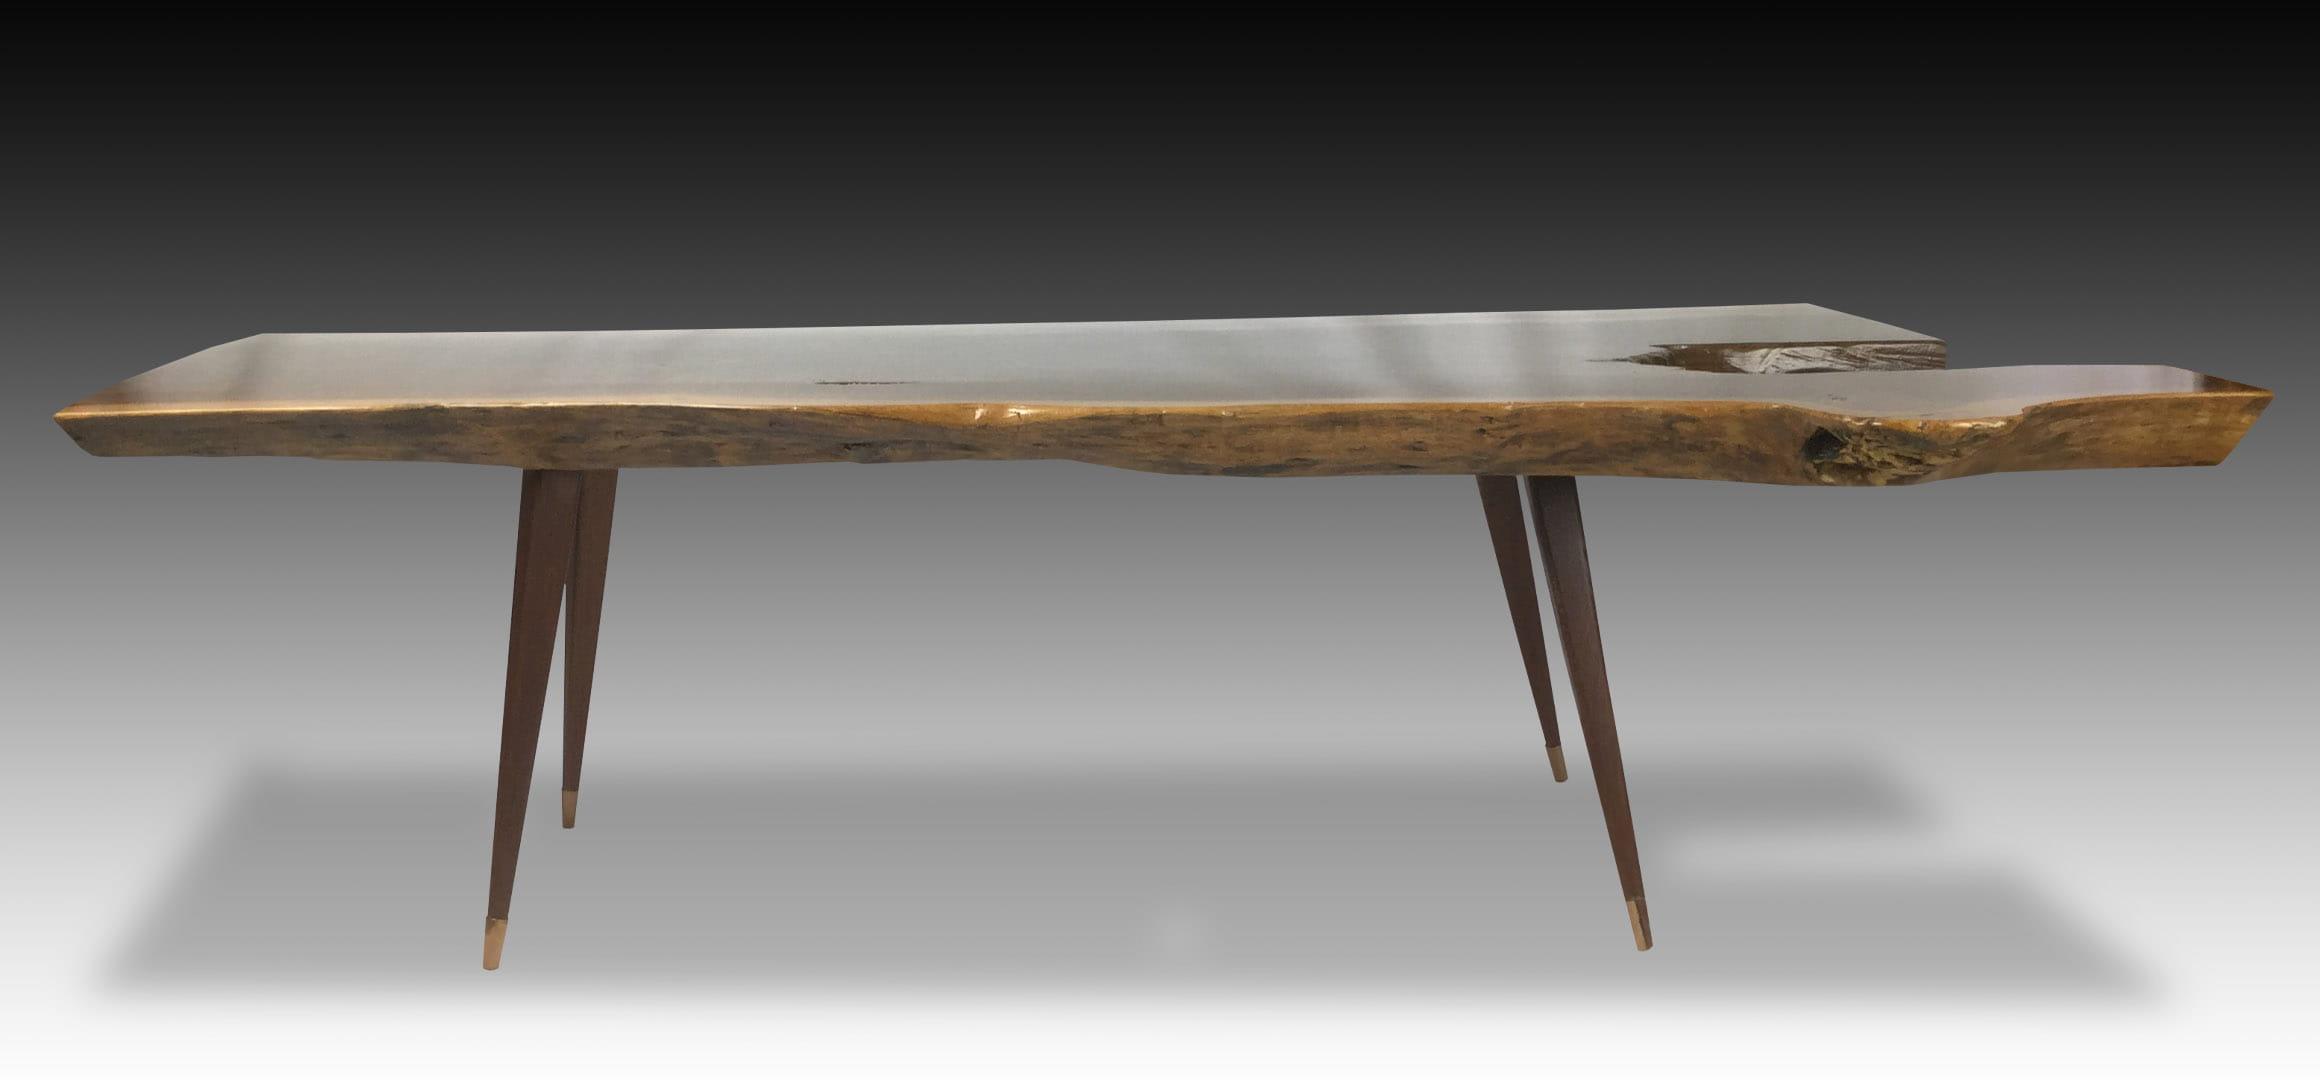 Leopard live edge walnut wood coffee table side view